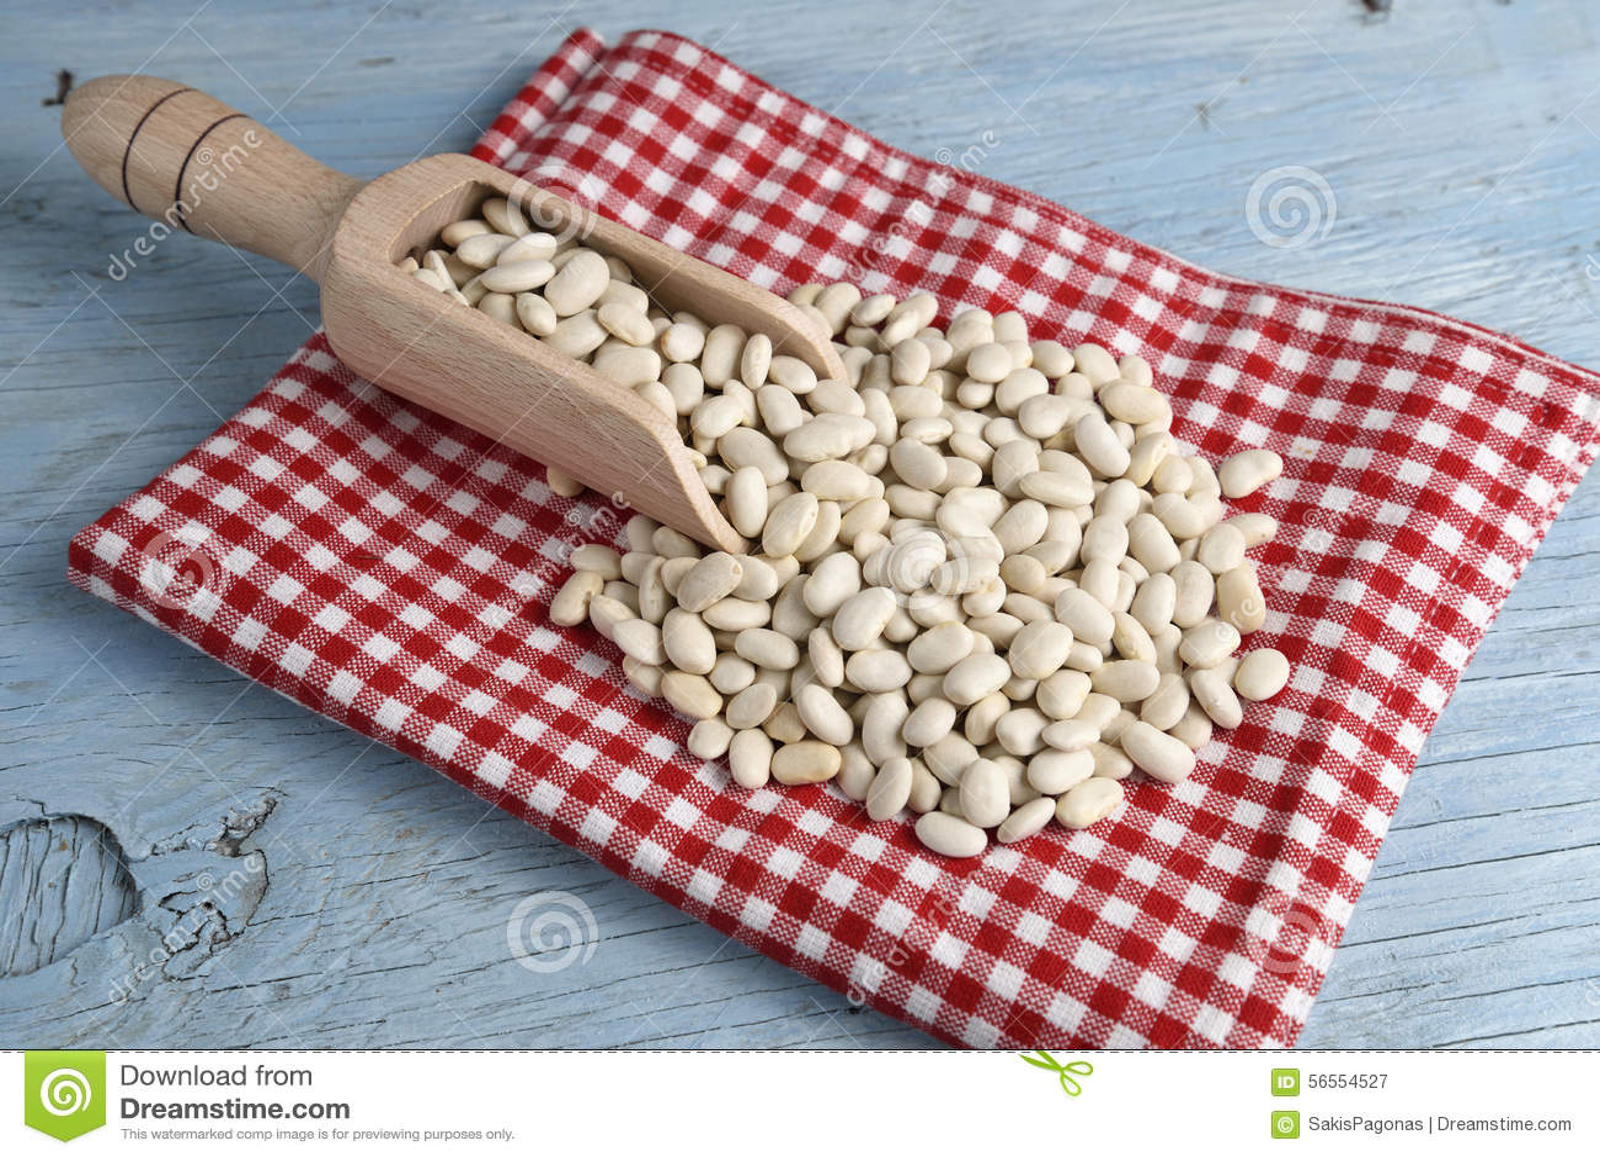 Download Ξύλινη σέσουλα με τα άσπρα φασόλια Στοκ Εικόνα - εικόνα από μάγειρας, φυτικός: 56554527